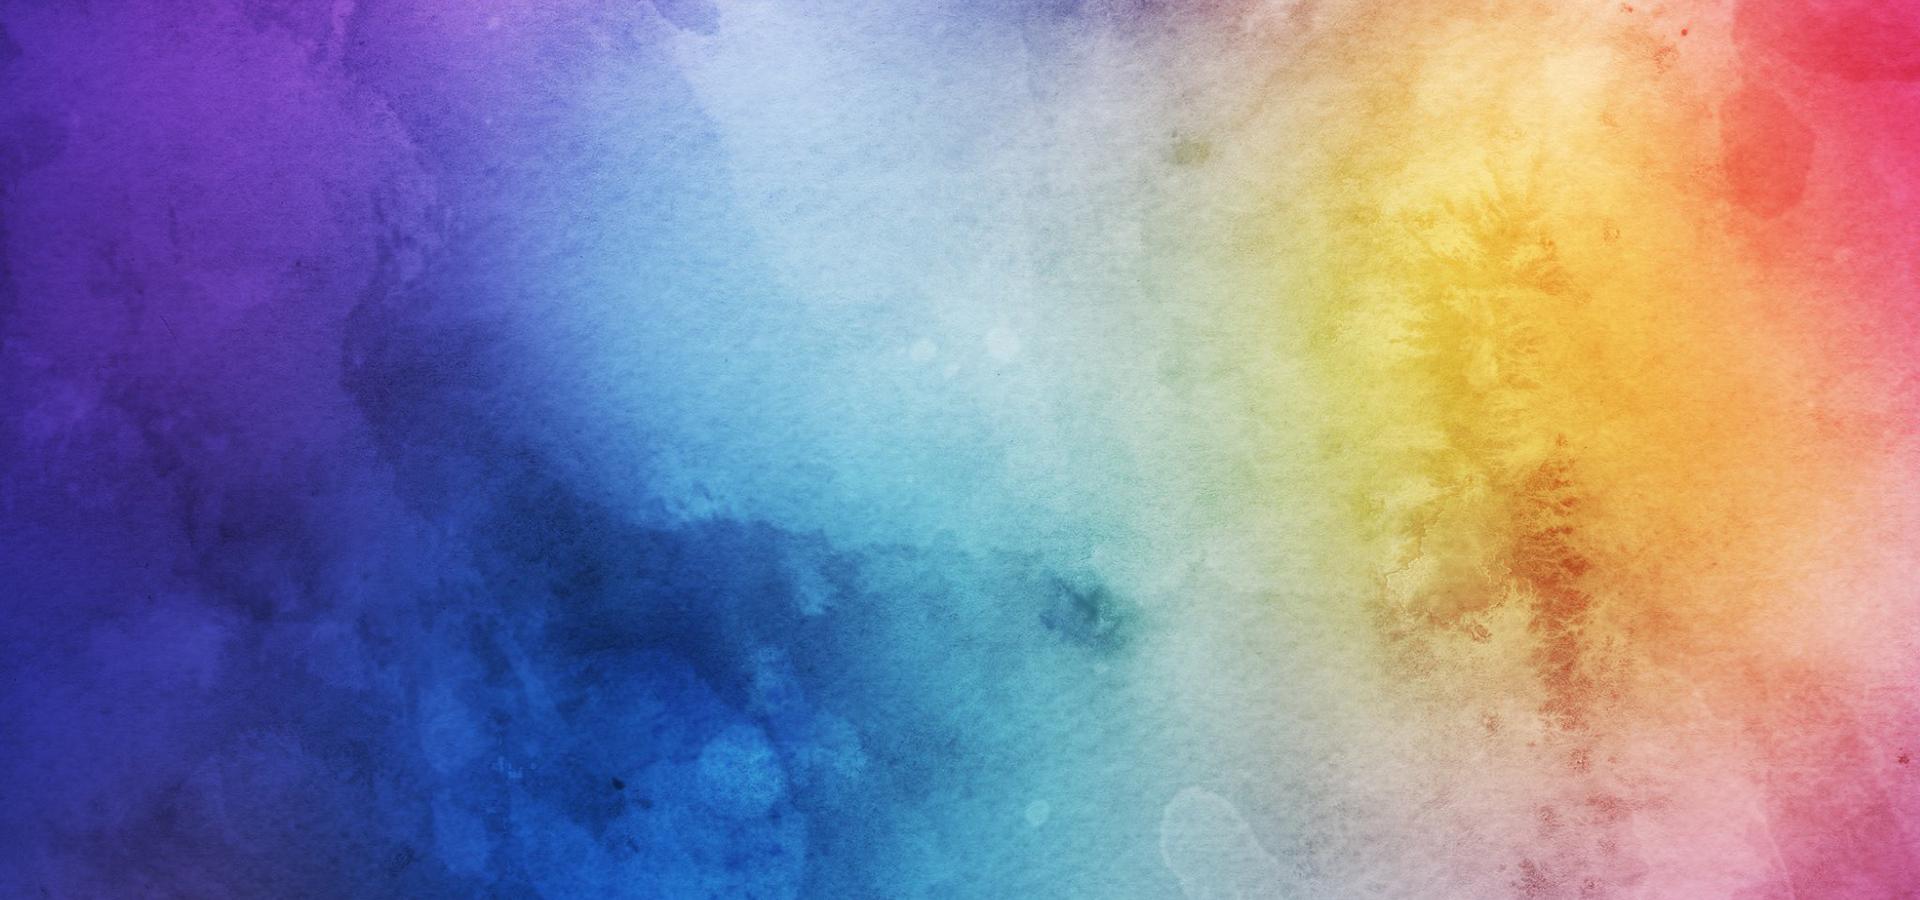 watercolor texture blue color gradual background image